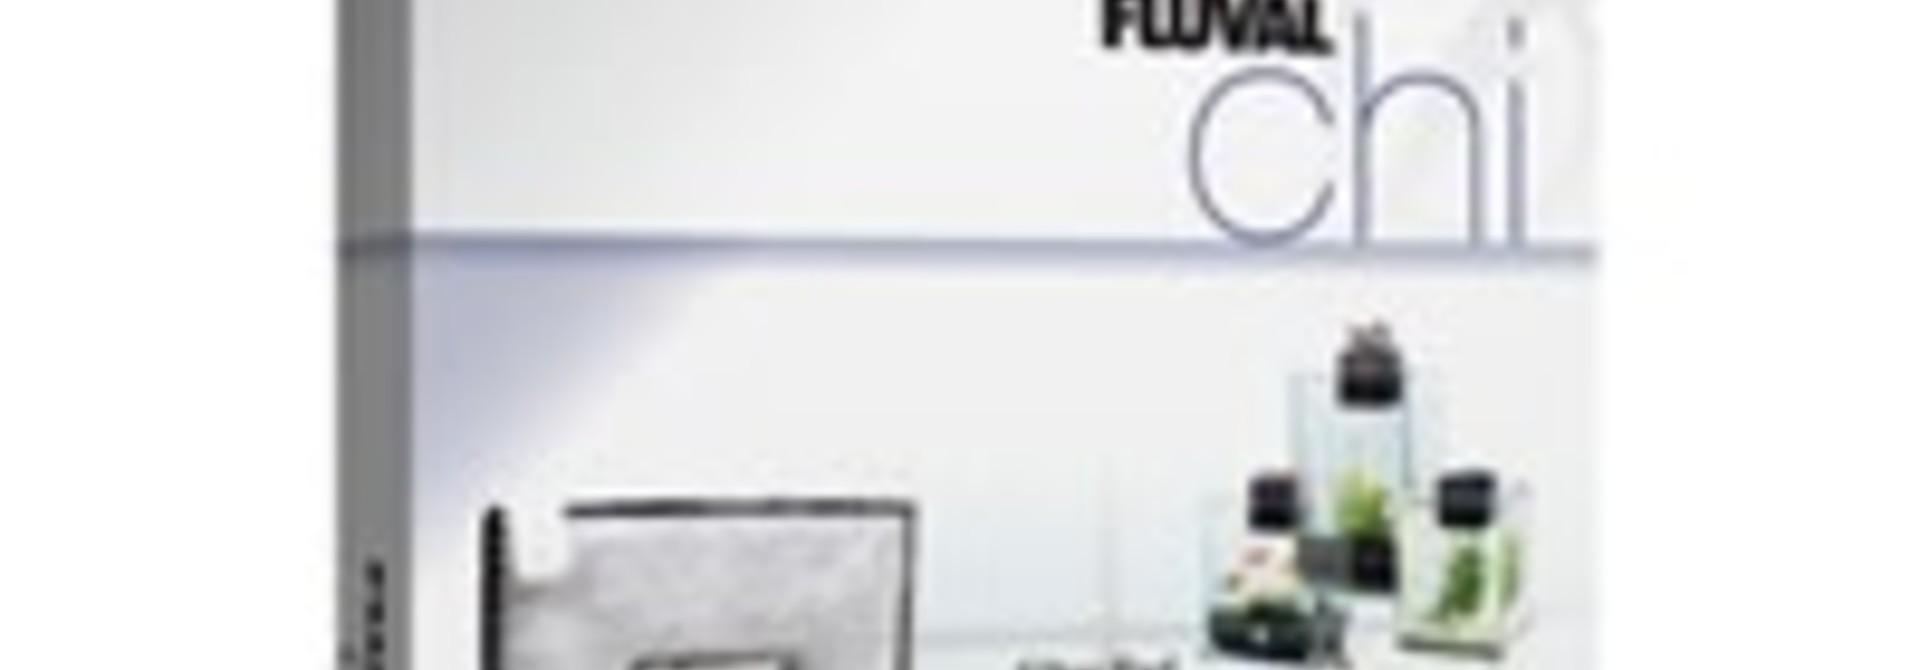 Fluval Chi Filter Pad - 3 pack